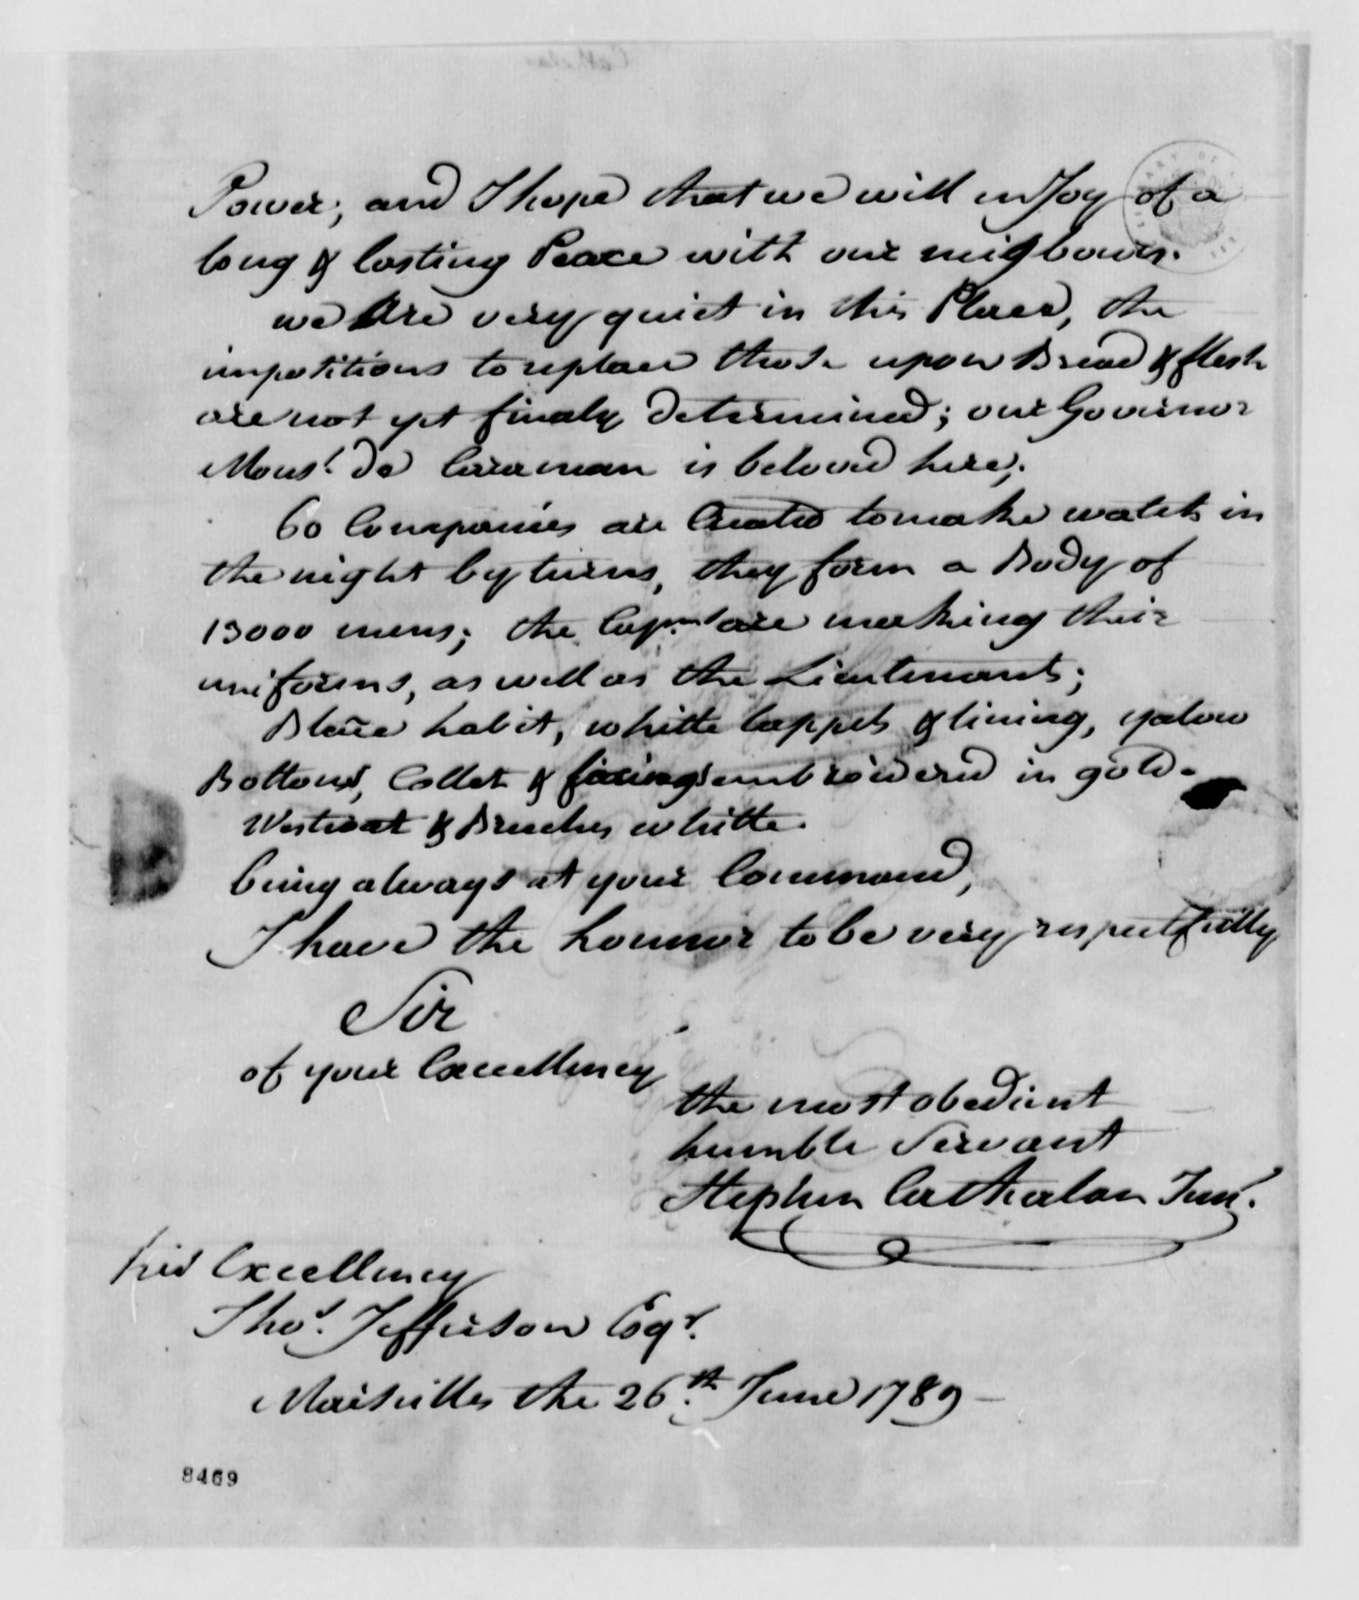 Stephen Cathalan, Jr. to Thomas Jefferson, June 26, 1789